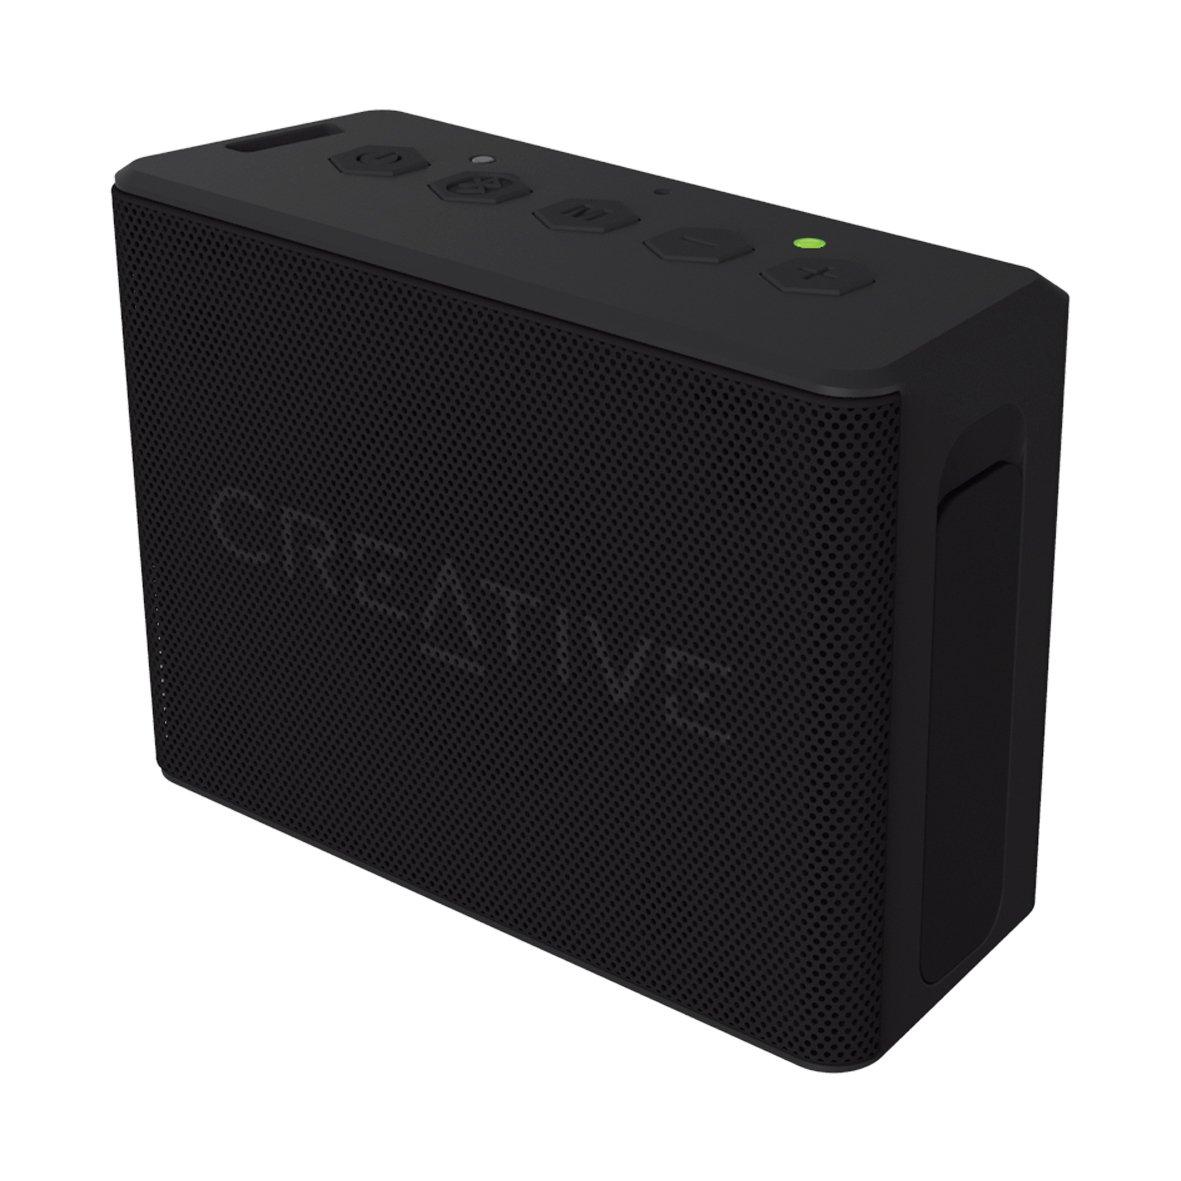 Creative Labs MUVO 2c Stereo Rectangle Black